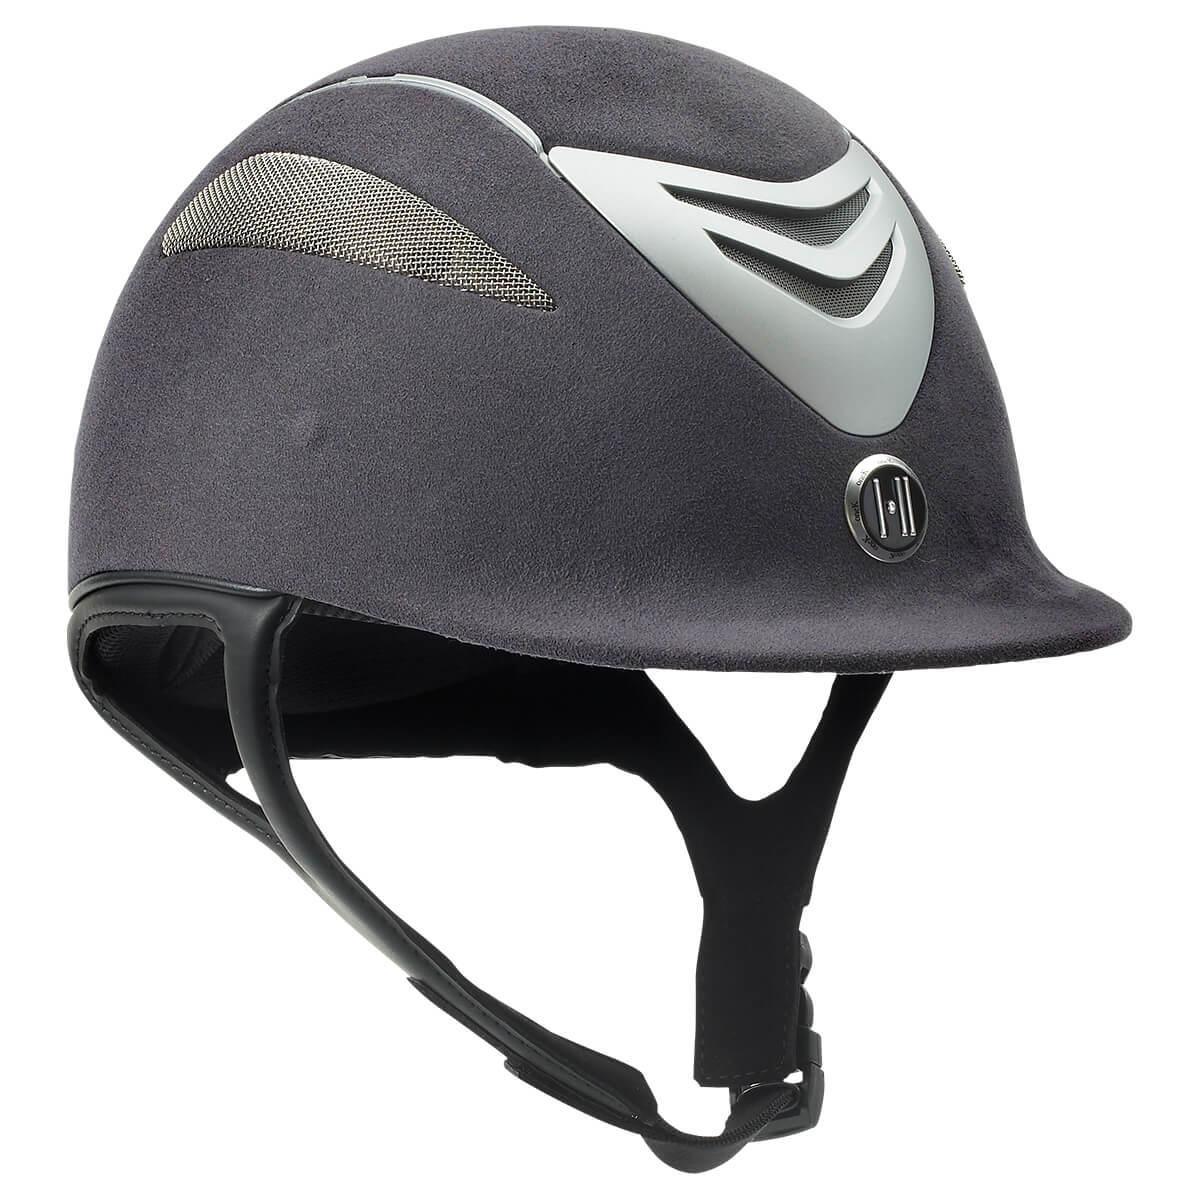 NEW NAVY BLUE VELVET with RHINESTONES English Equestrian Riding Helmet Cover